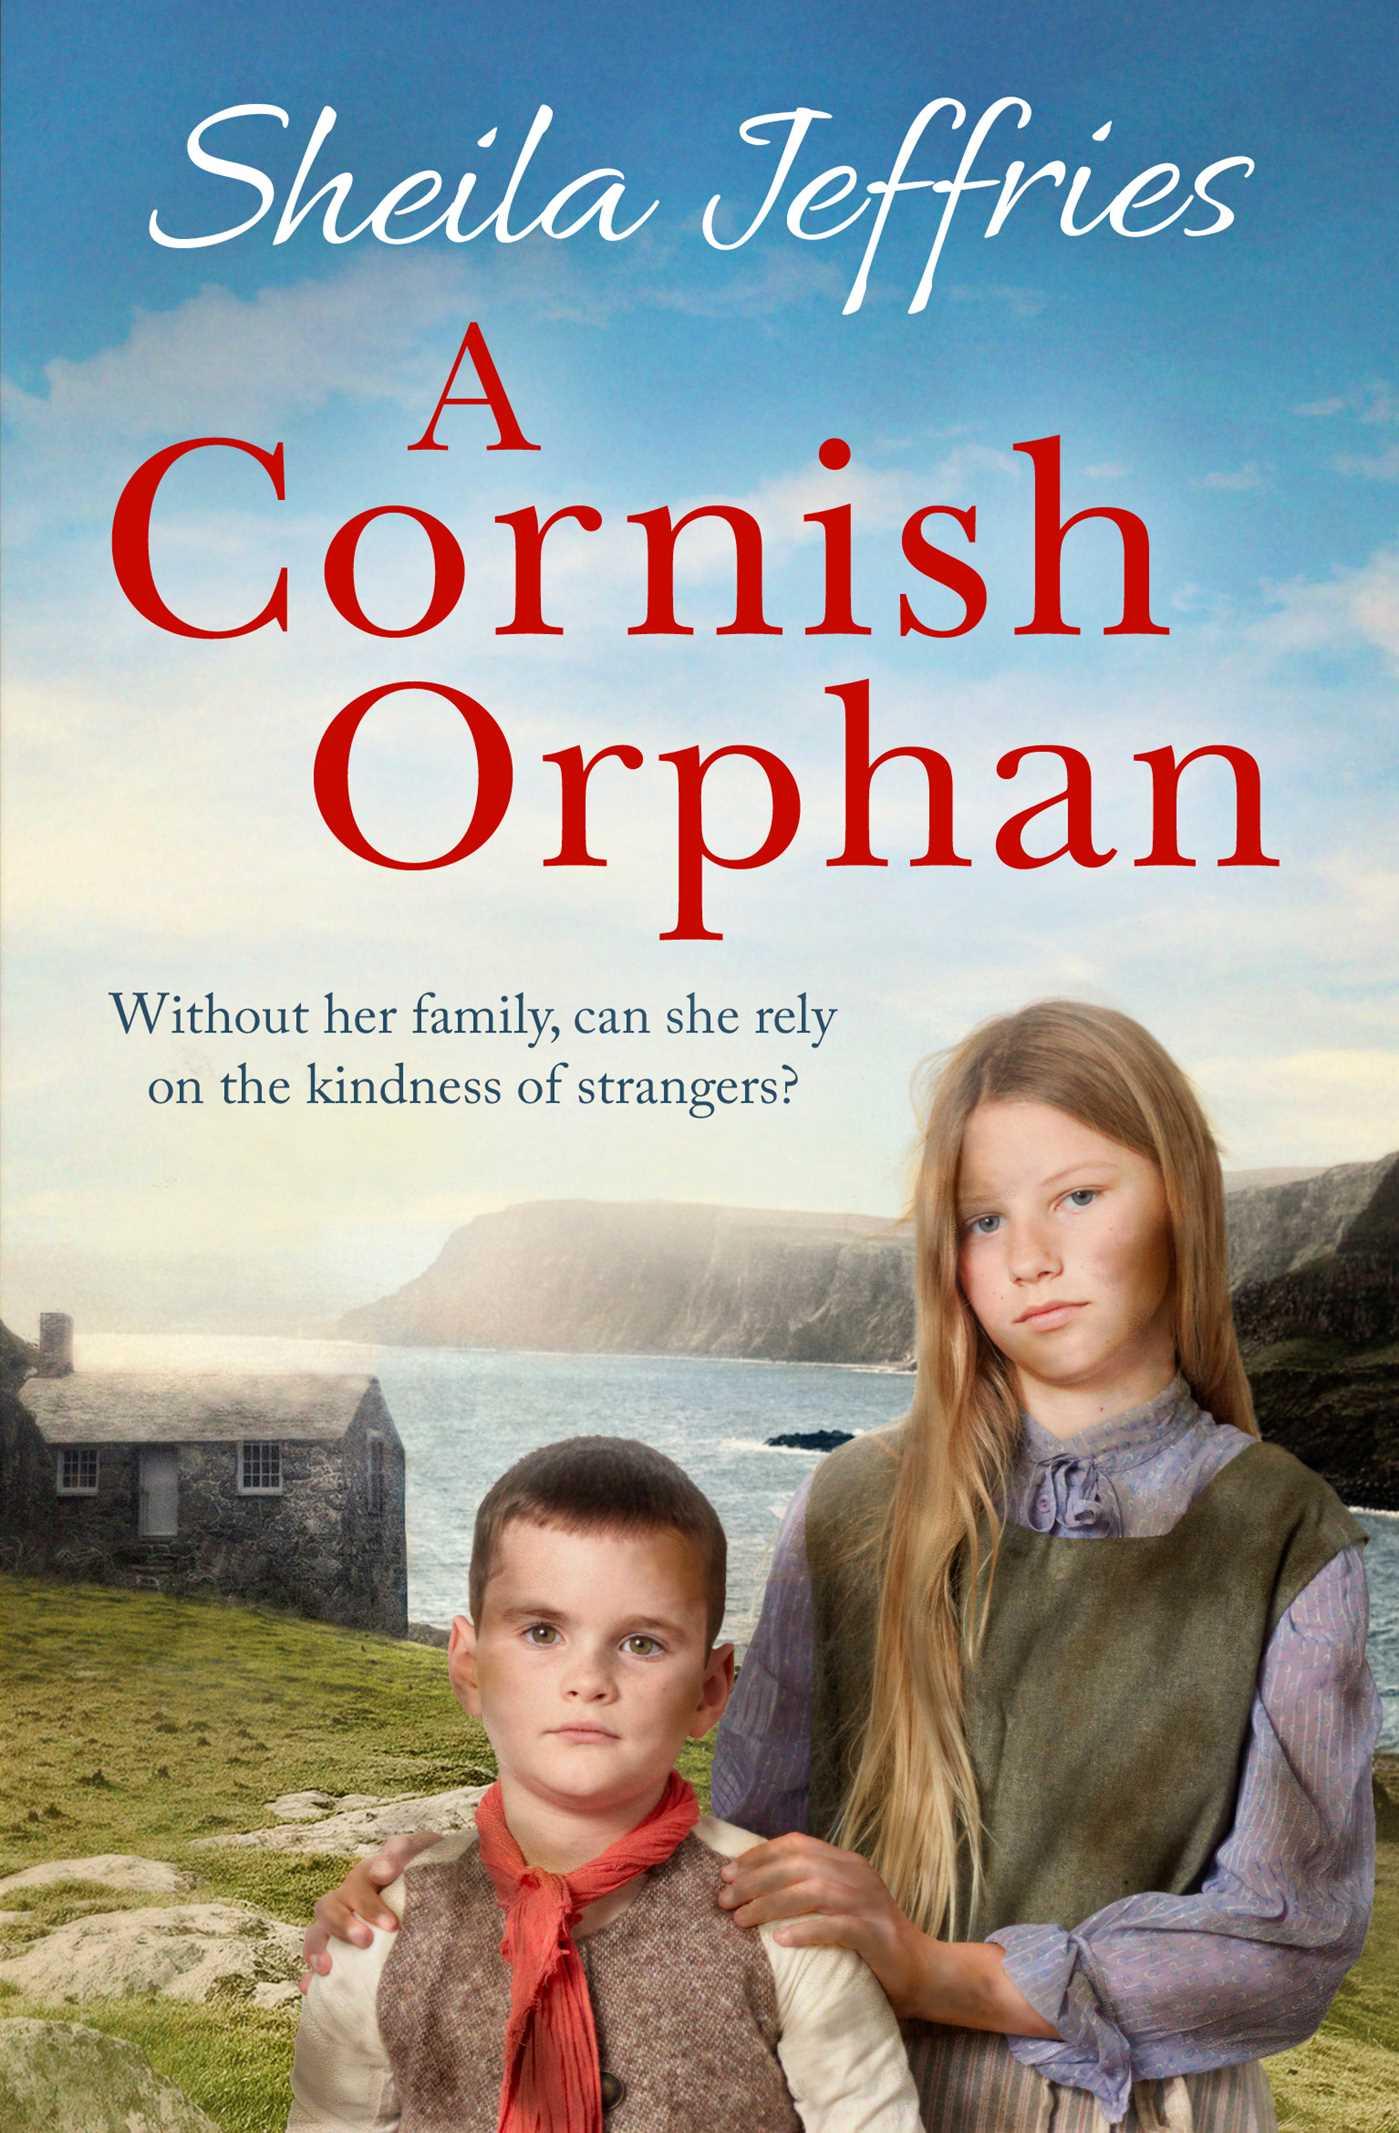 A cornish orphan 9781471165276 hr